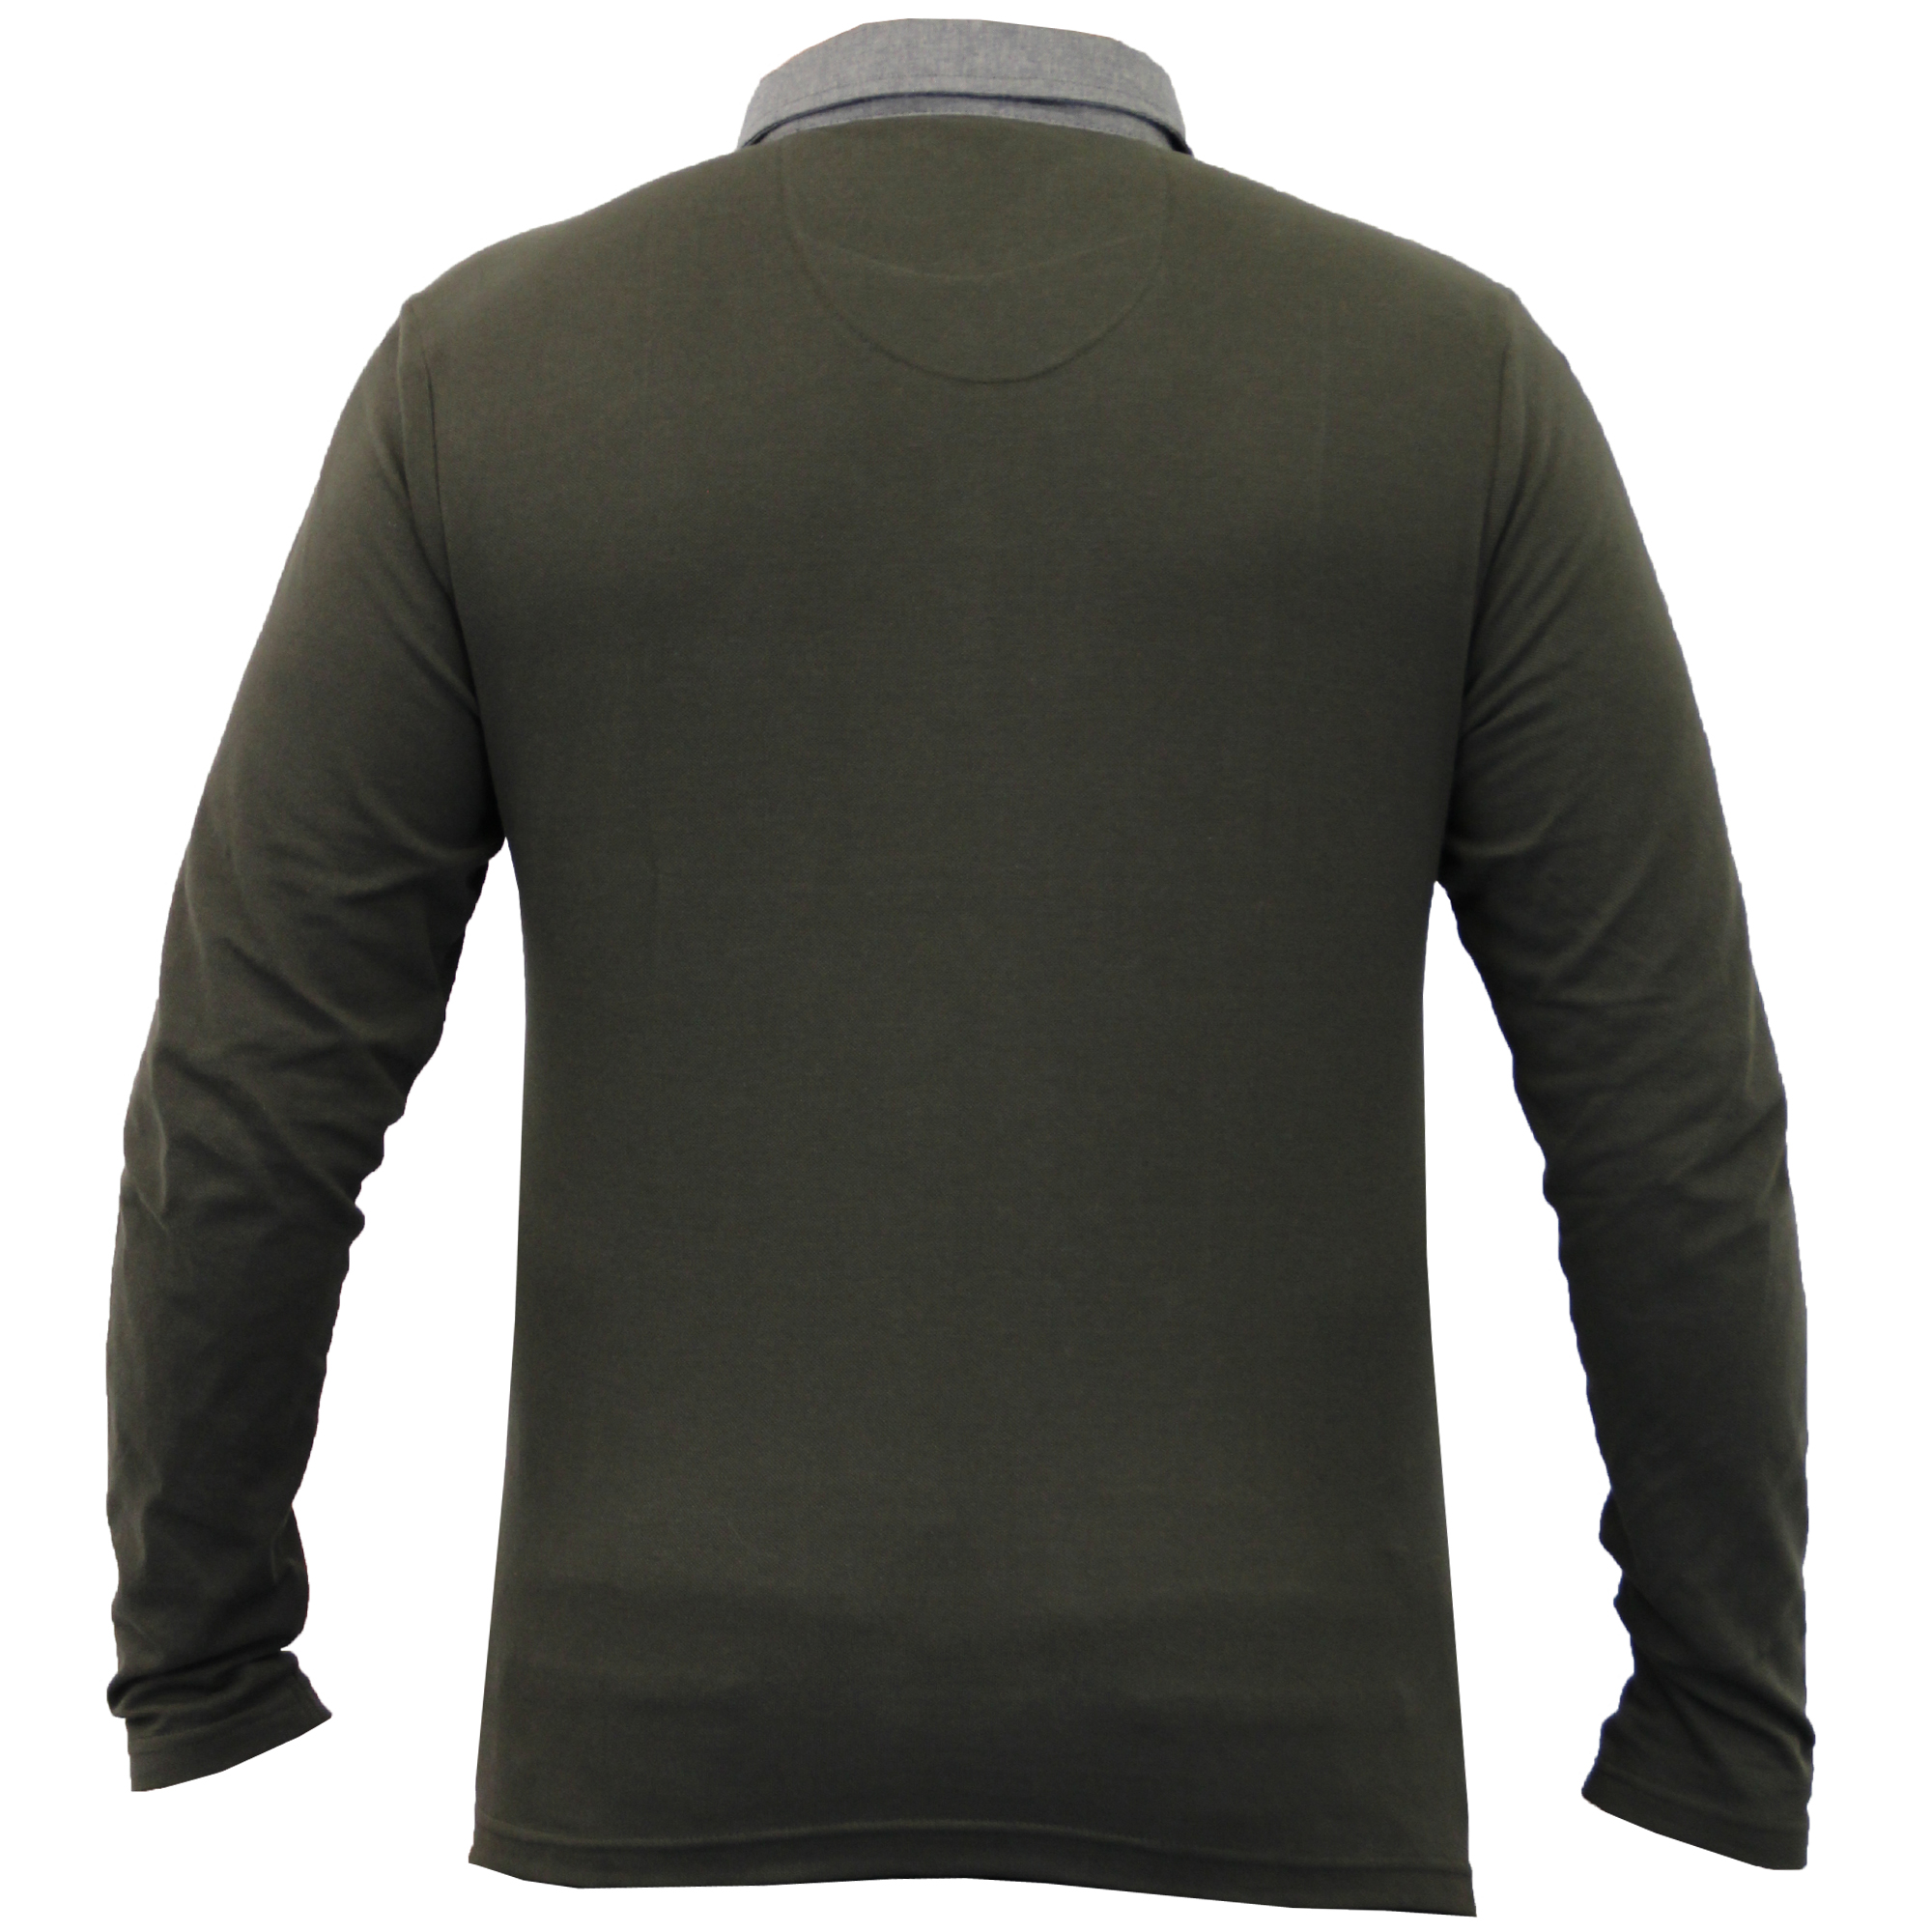 Homme-a-Manches-Longues-Jersey-Top-Brave-Soul-Pique-Polo-T-Shirt-A-Col-Ete-Neuf miniature 20